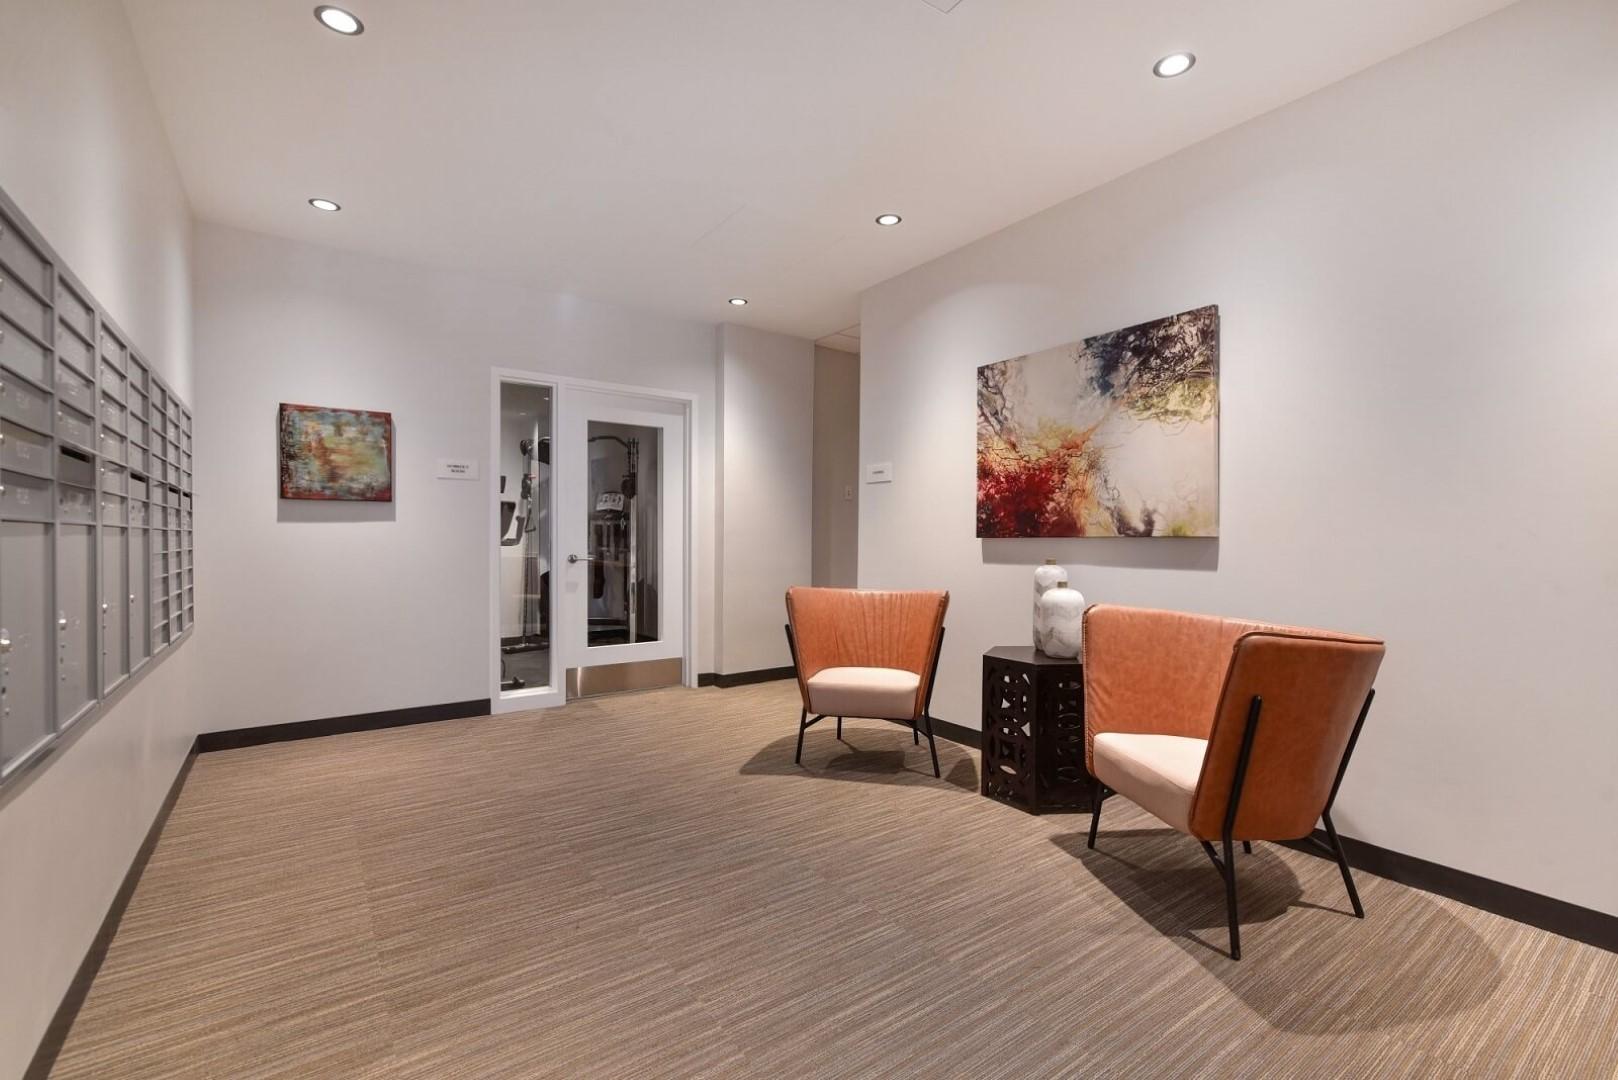 Lobby at 8 Harrison Apartments, Centre, Boston